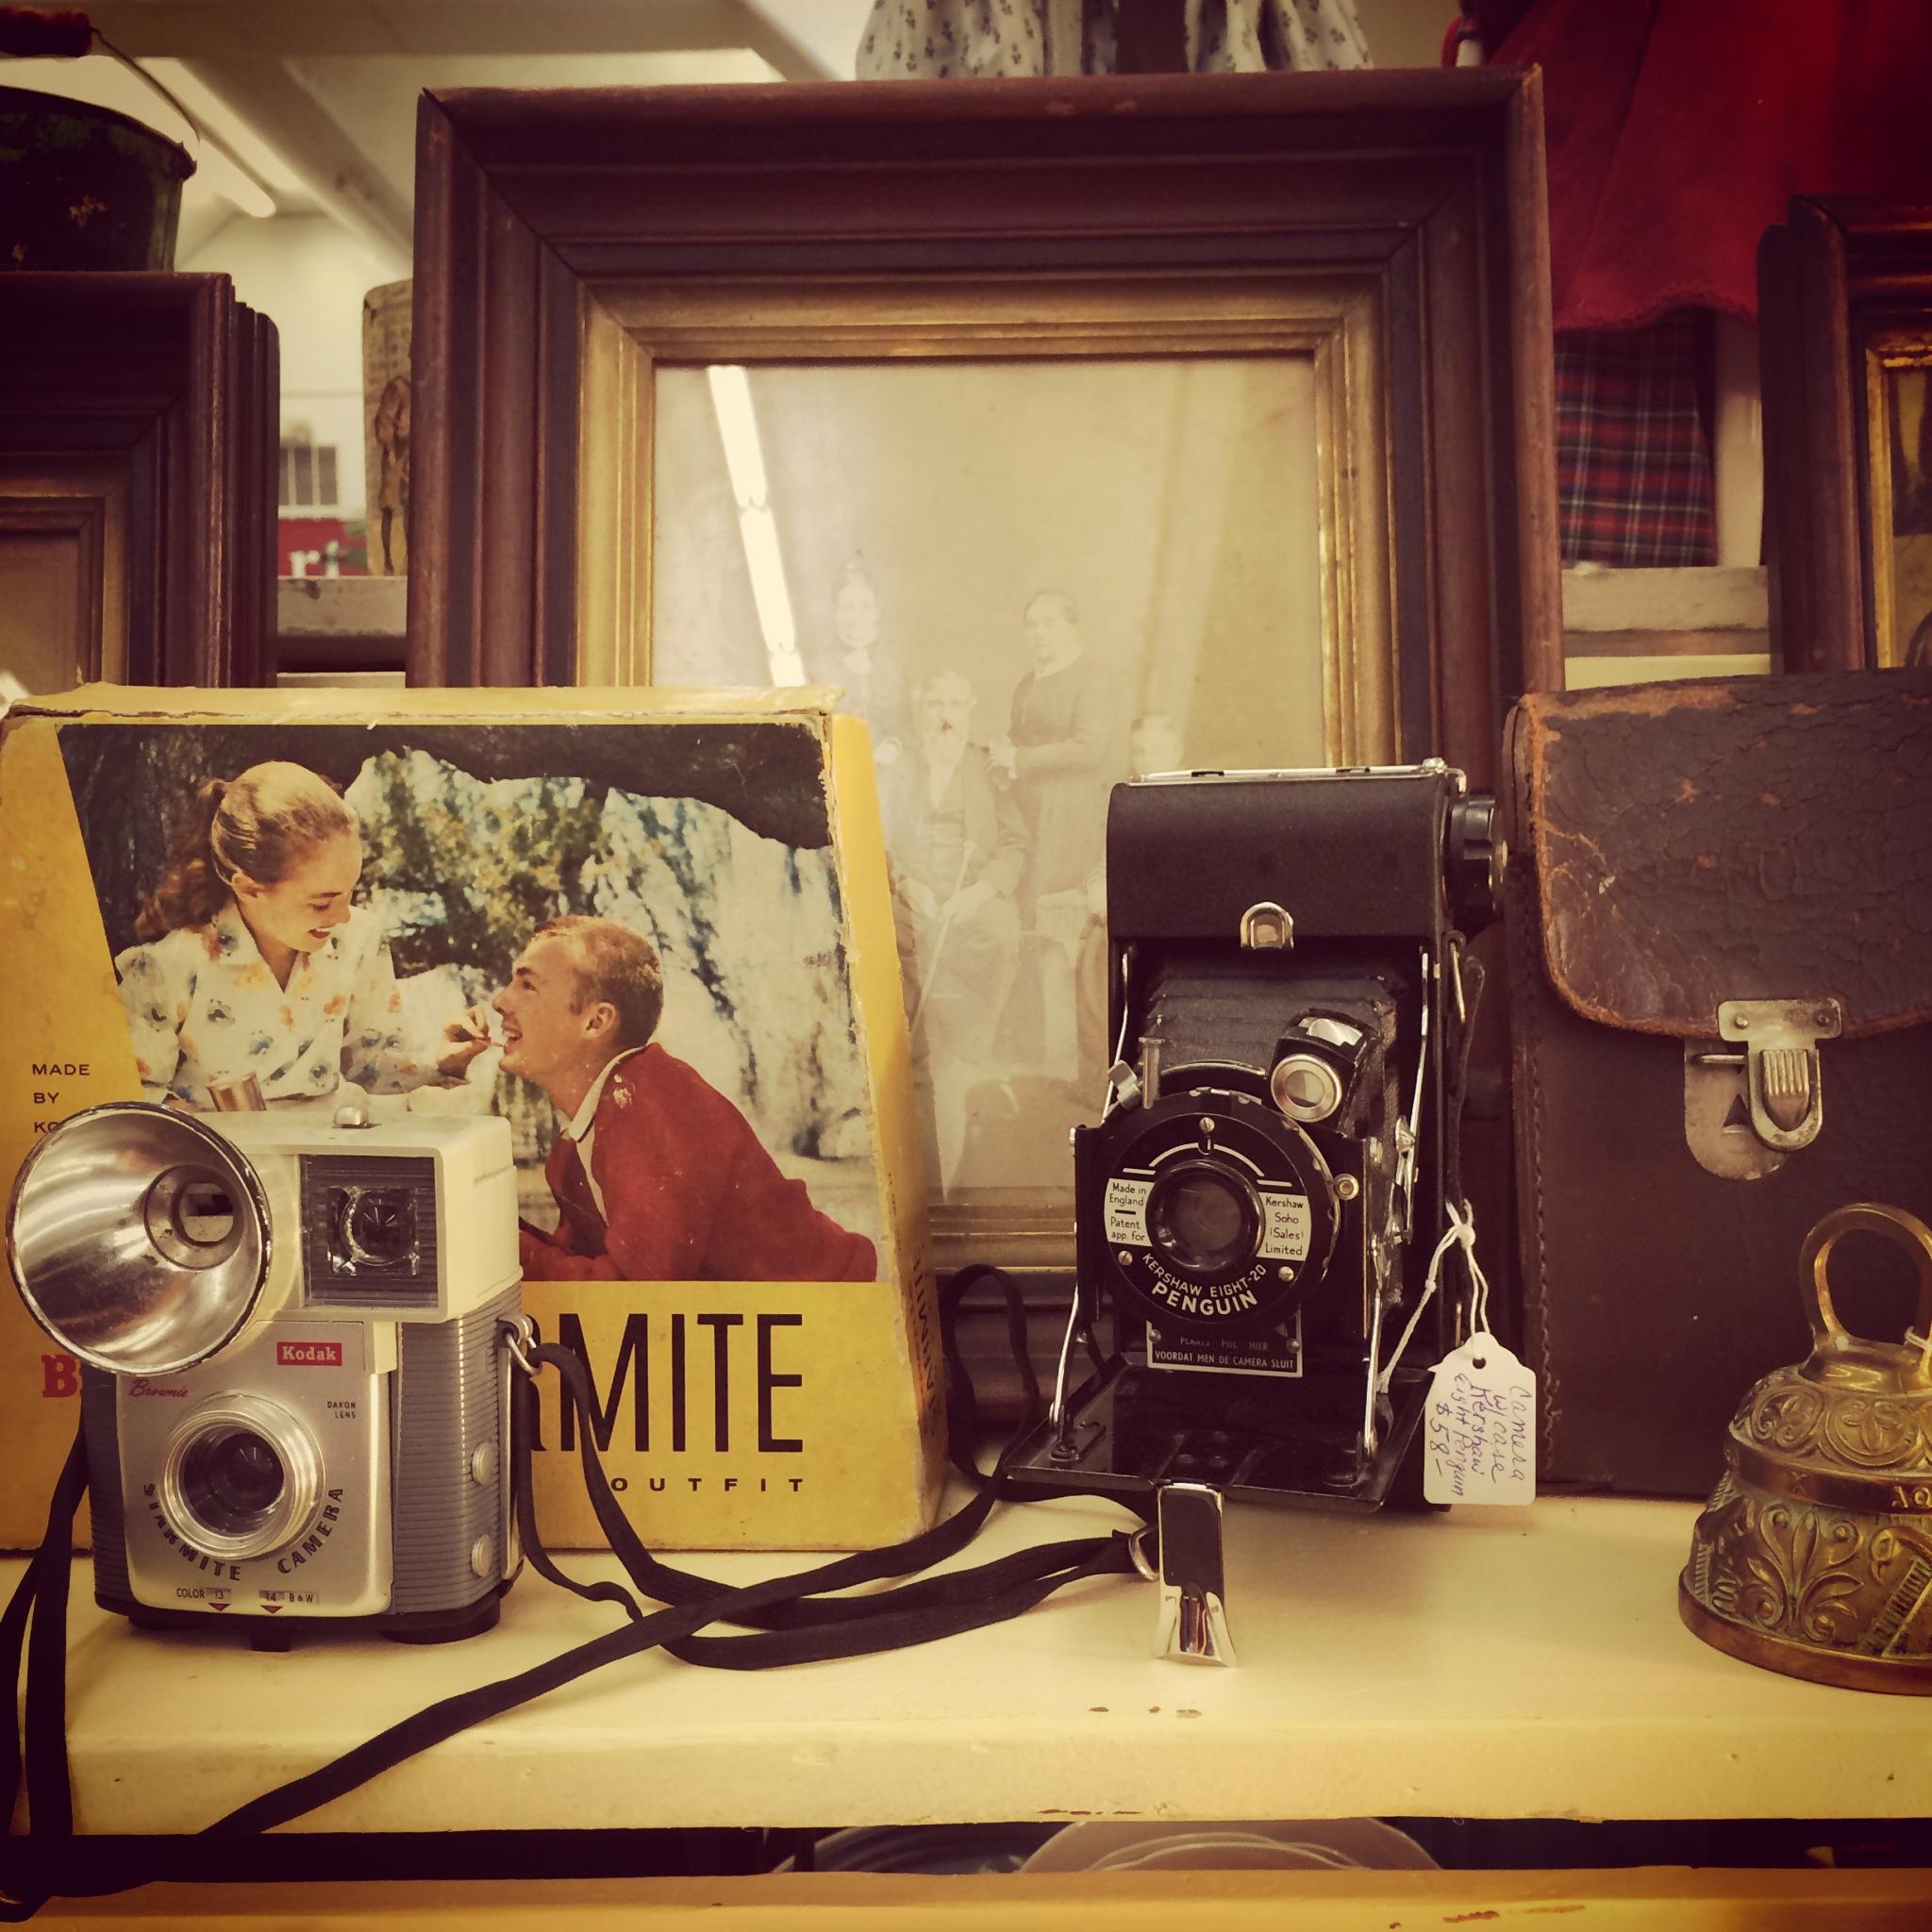 I love vintage cameras.